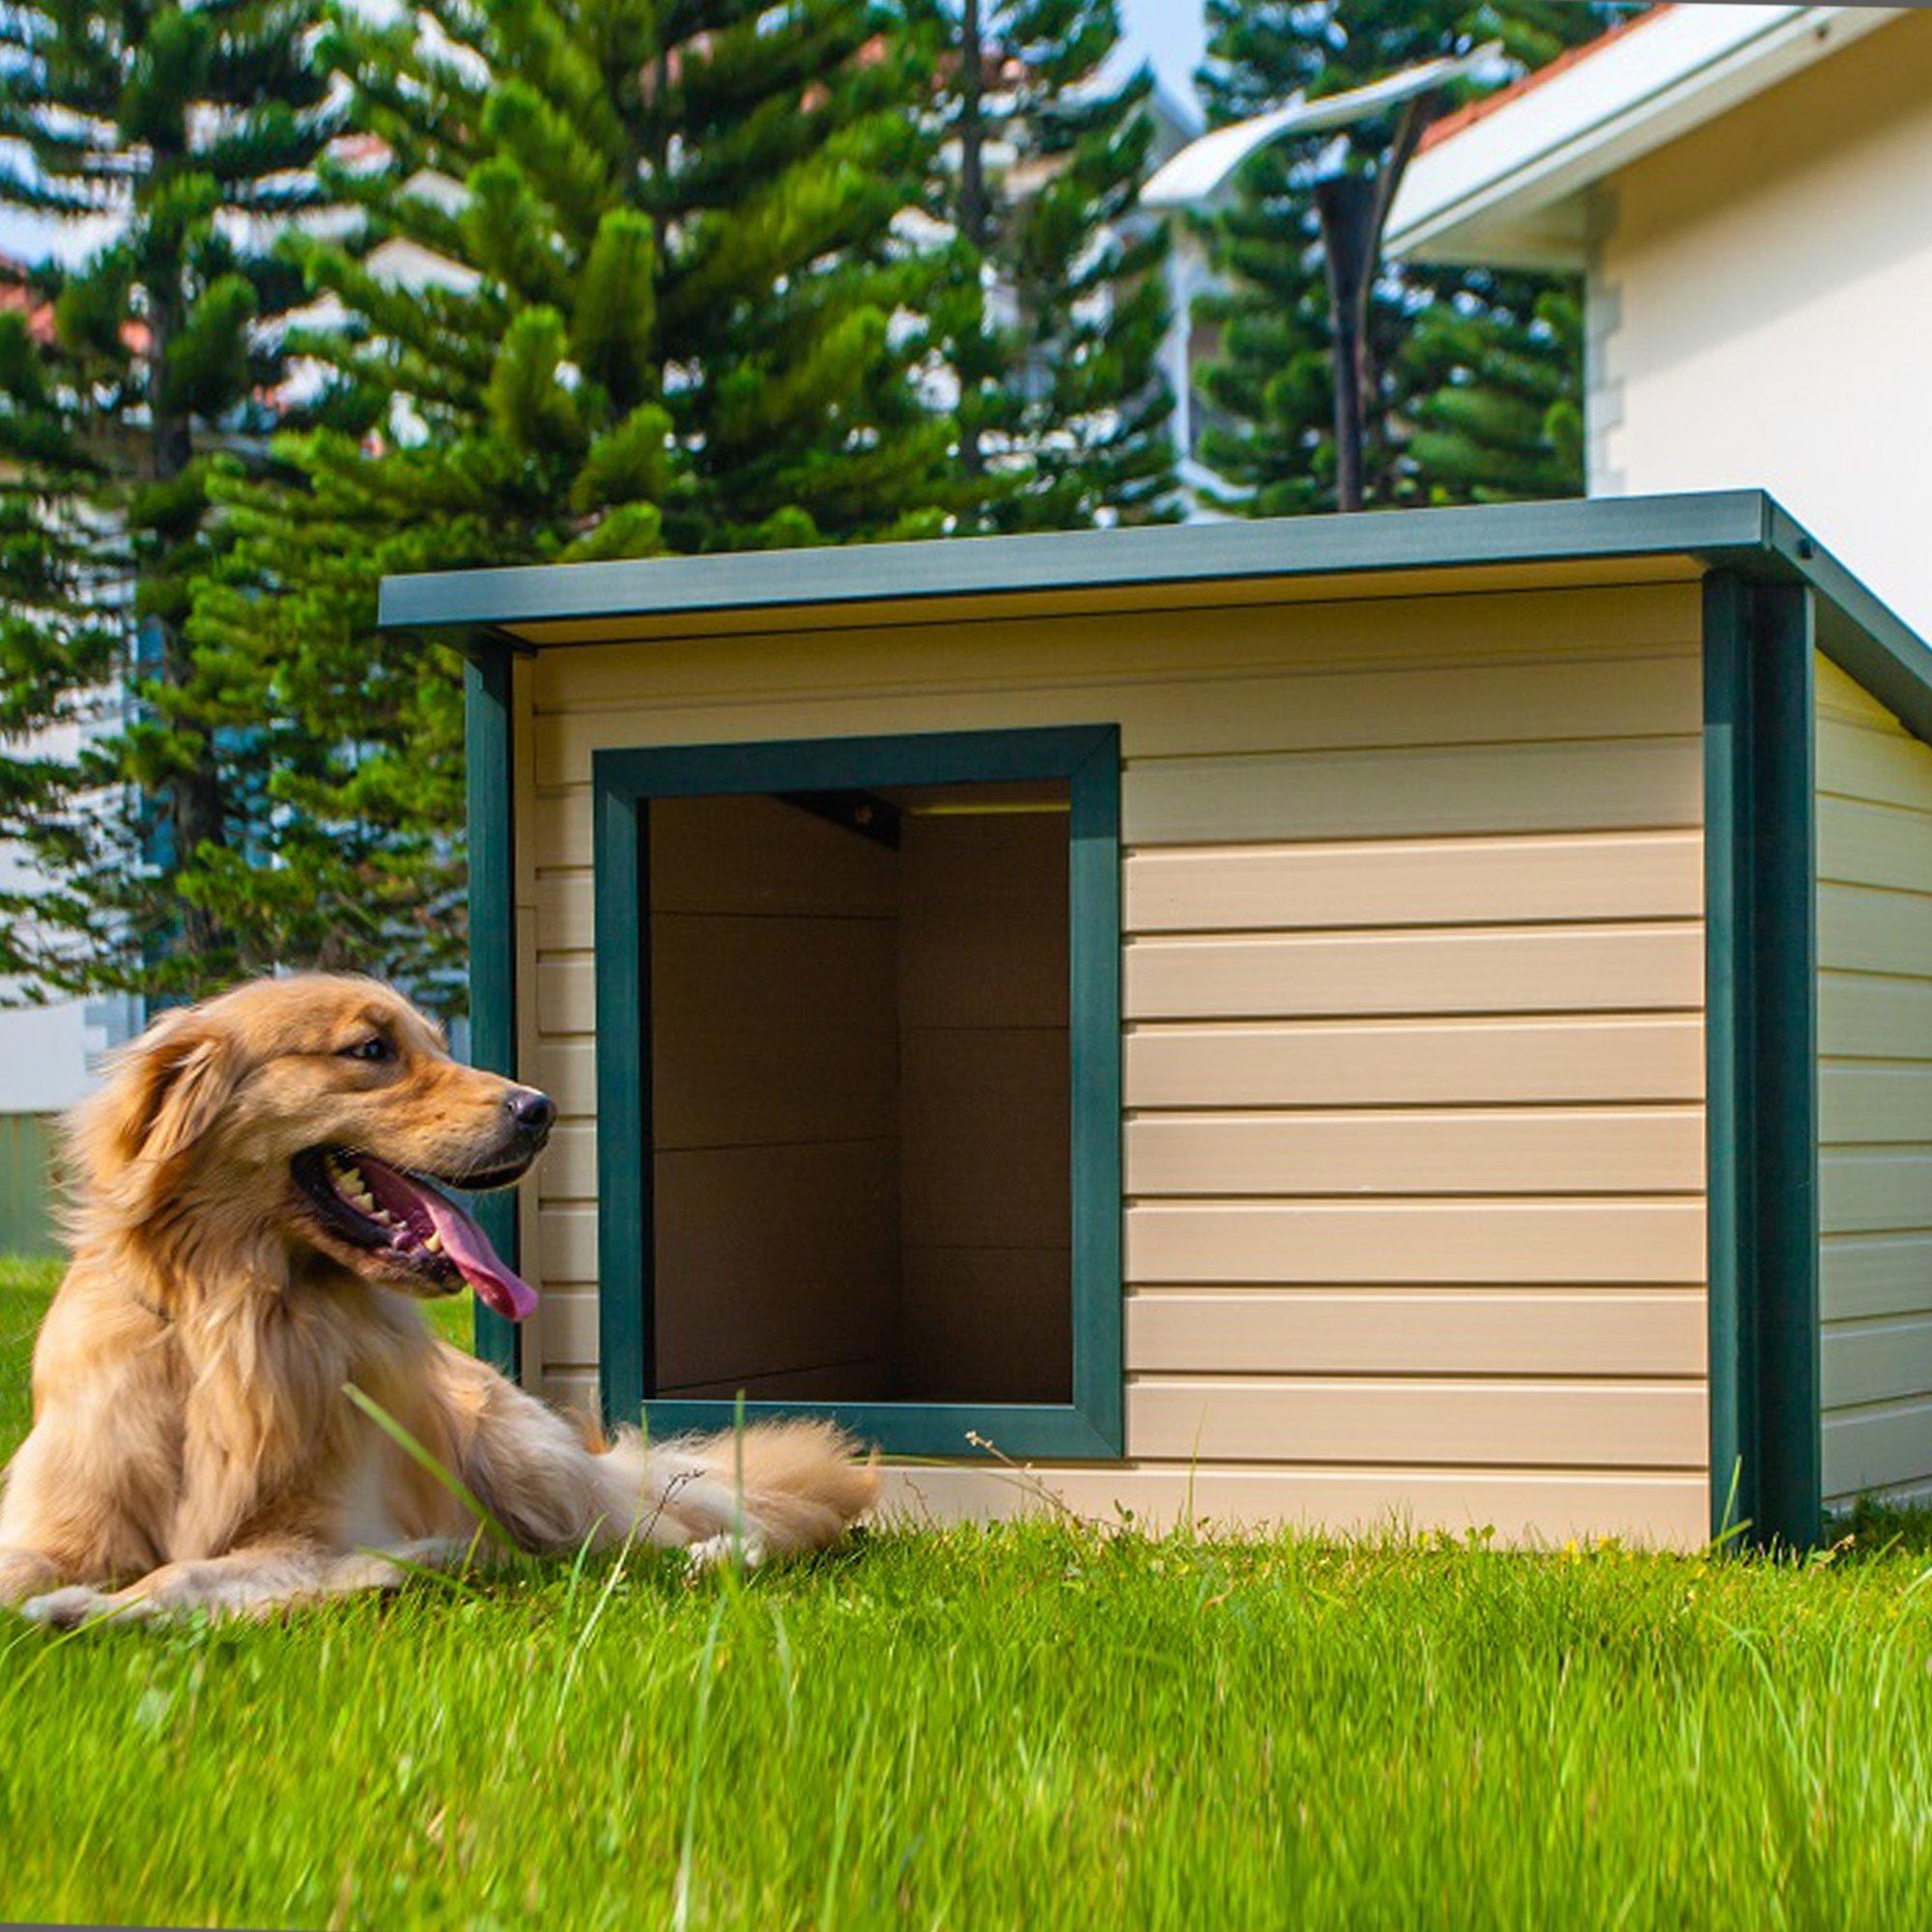 New Age Pet Rustic Lodge Dog House Medium Large Dog House Cool Dog Houses Insulated Dog House